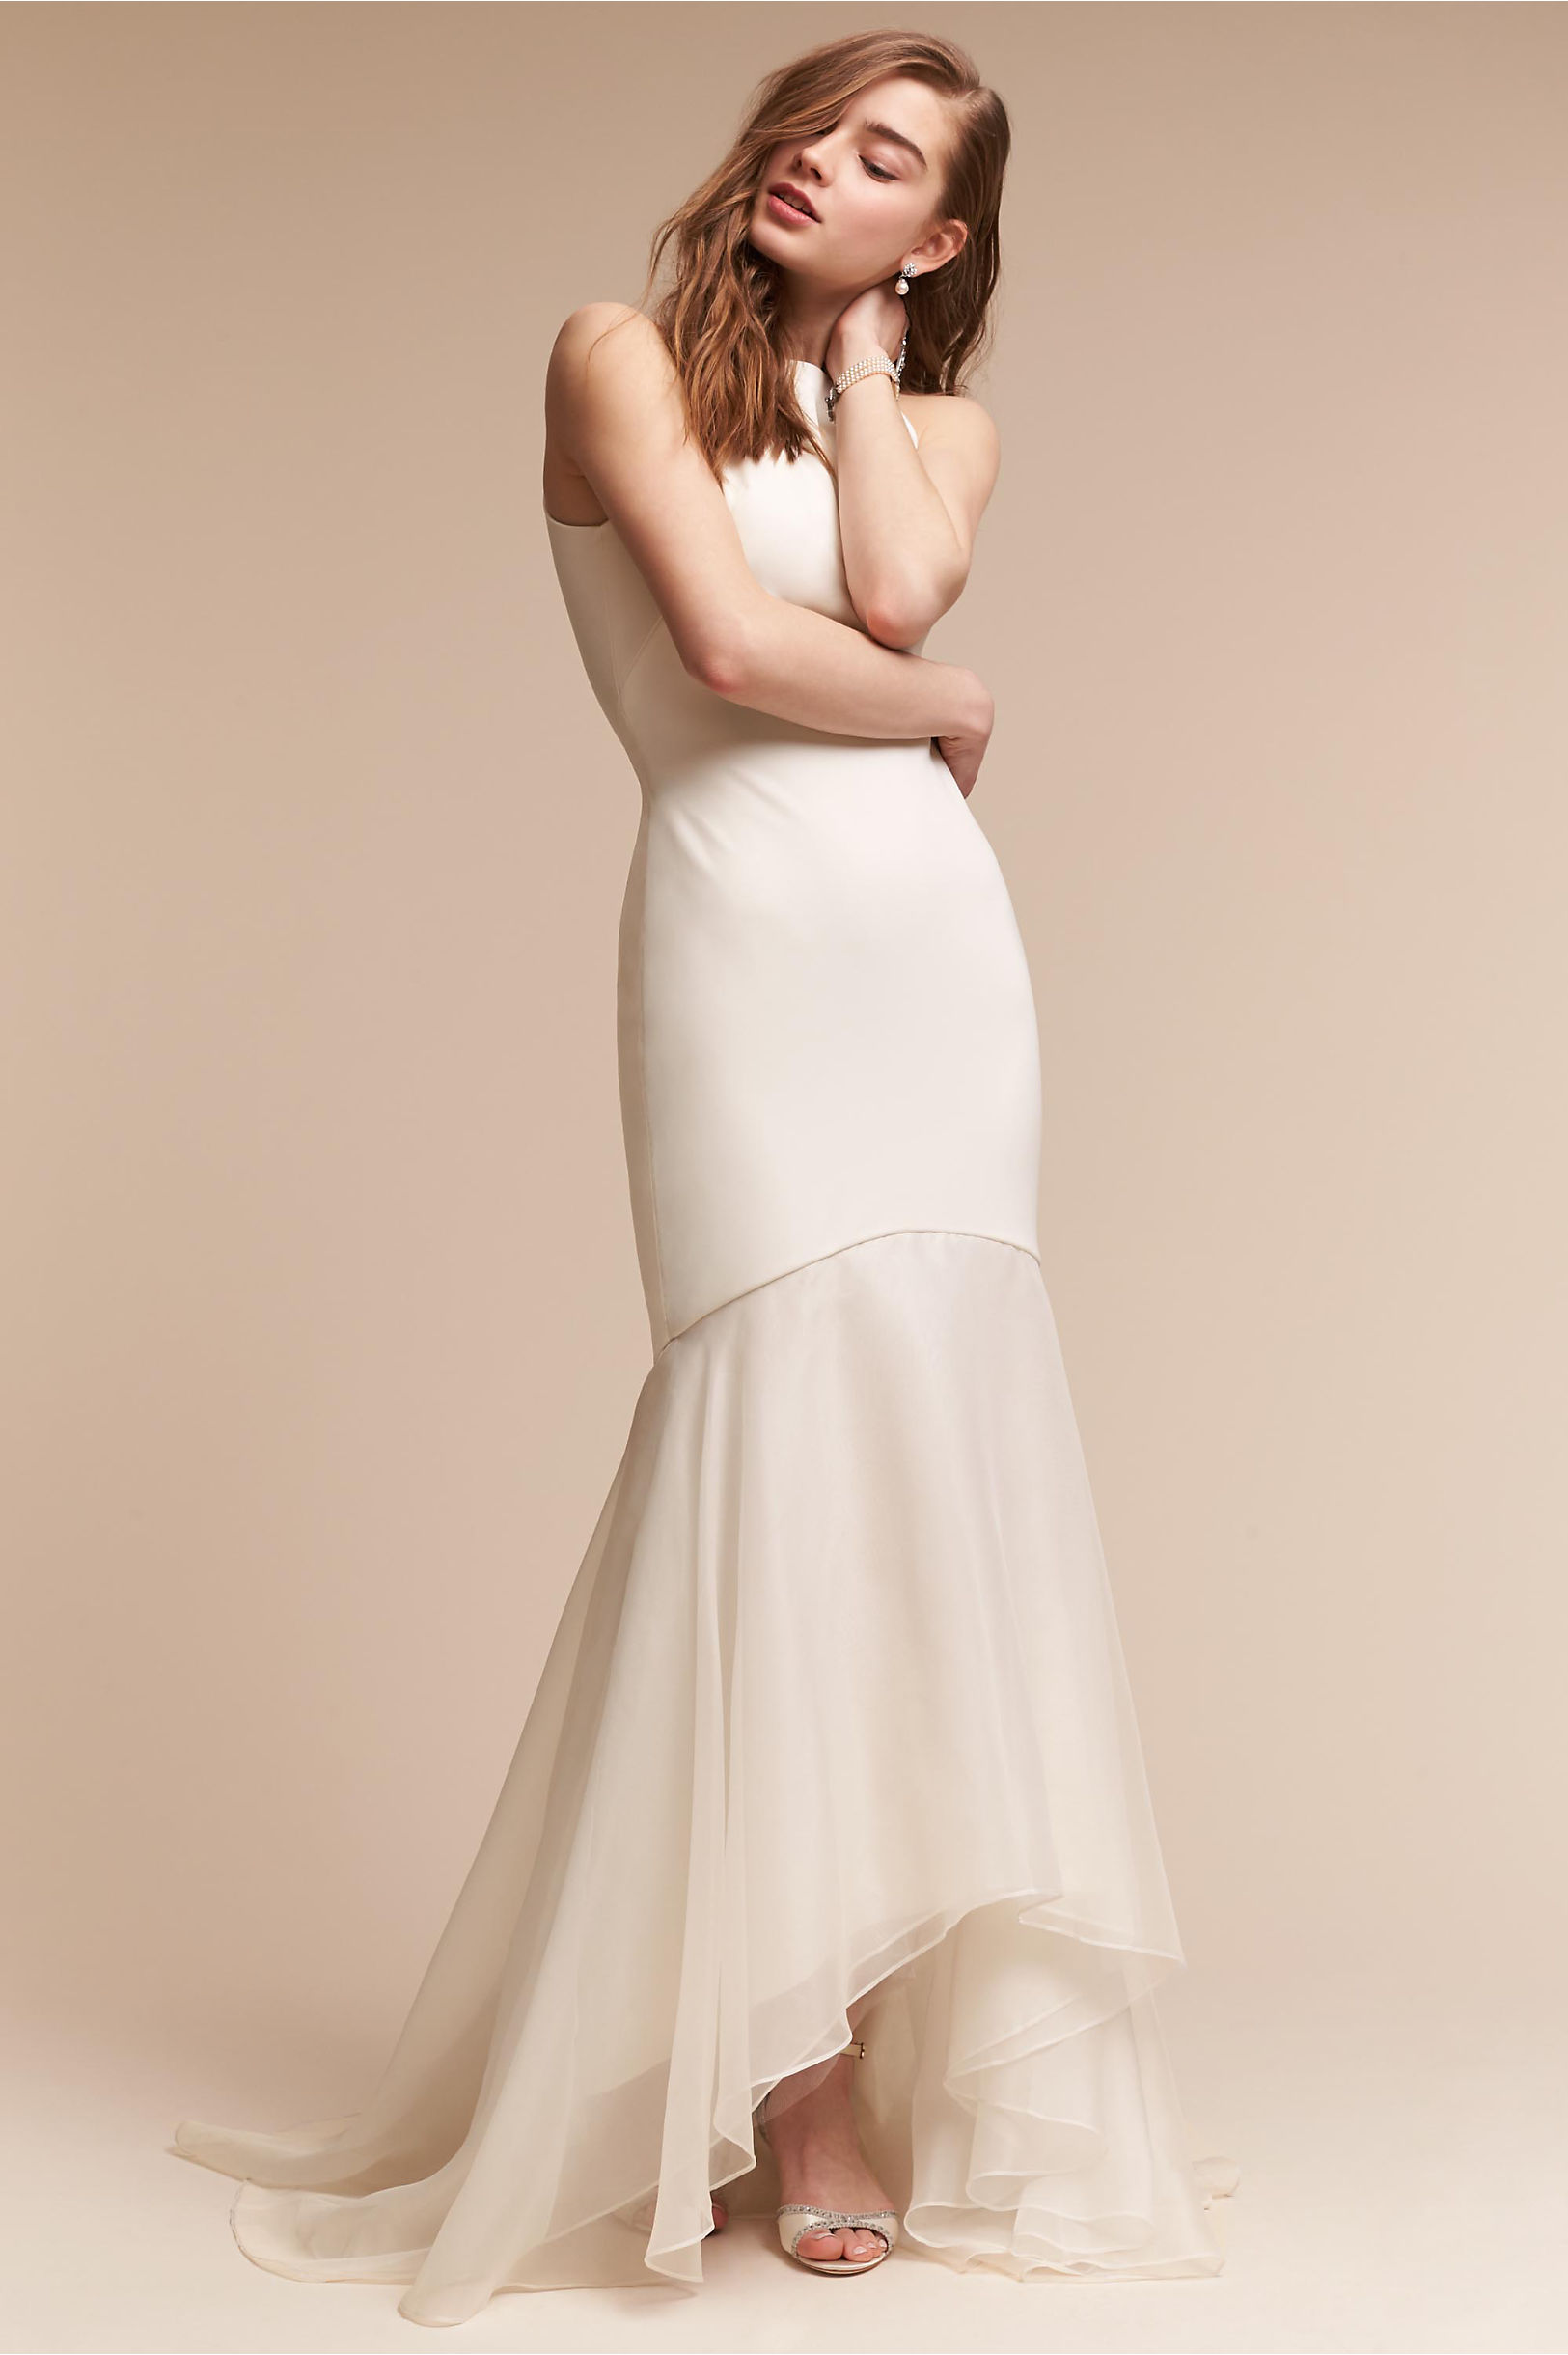 Elle Gown in Sale | BHLDN